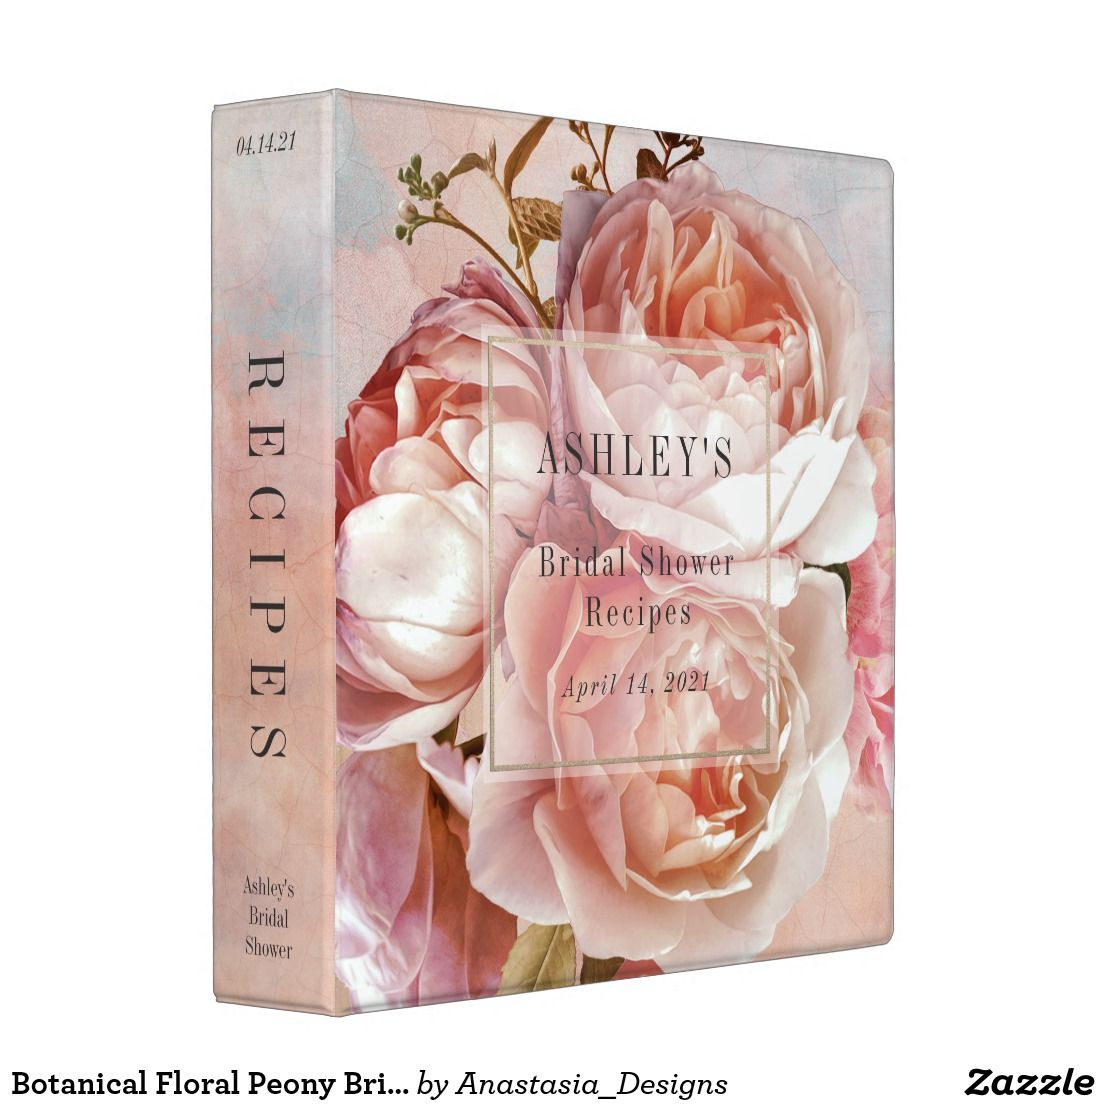 Botanical Floral Peony Bridal Shower Recipe Binder